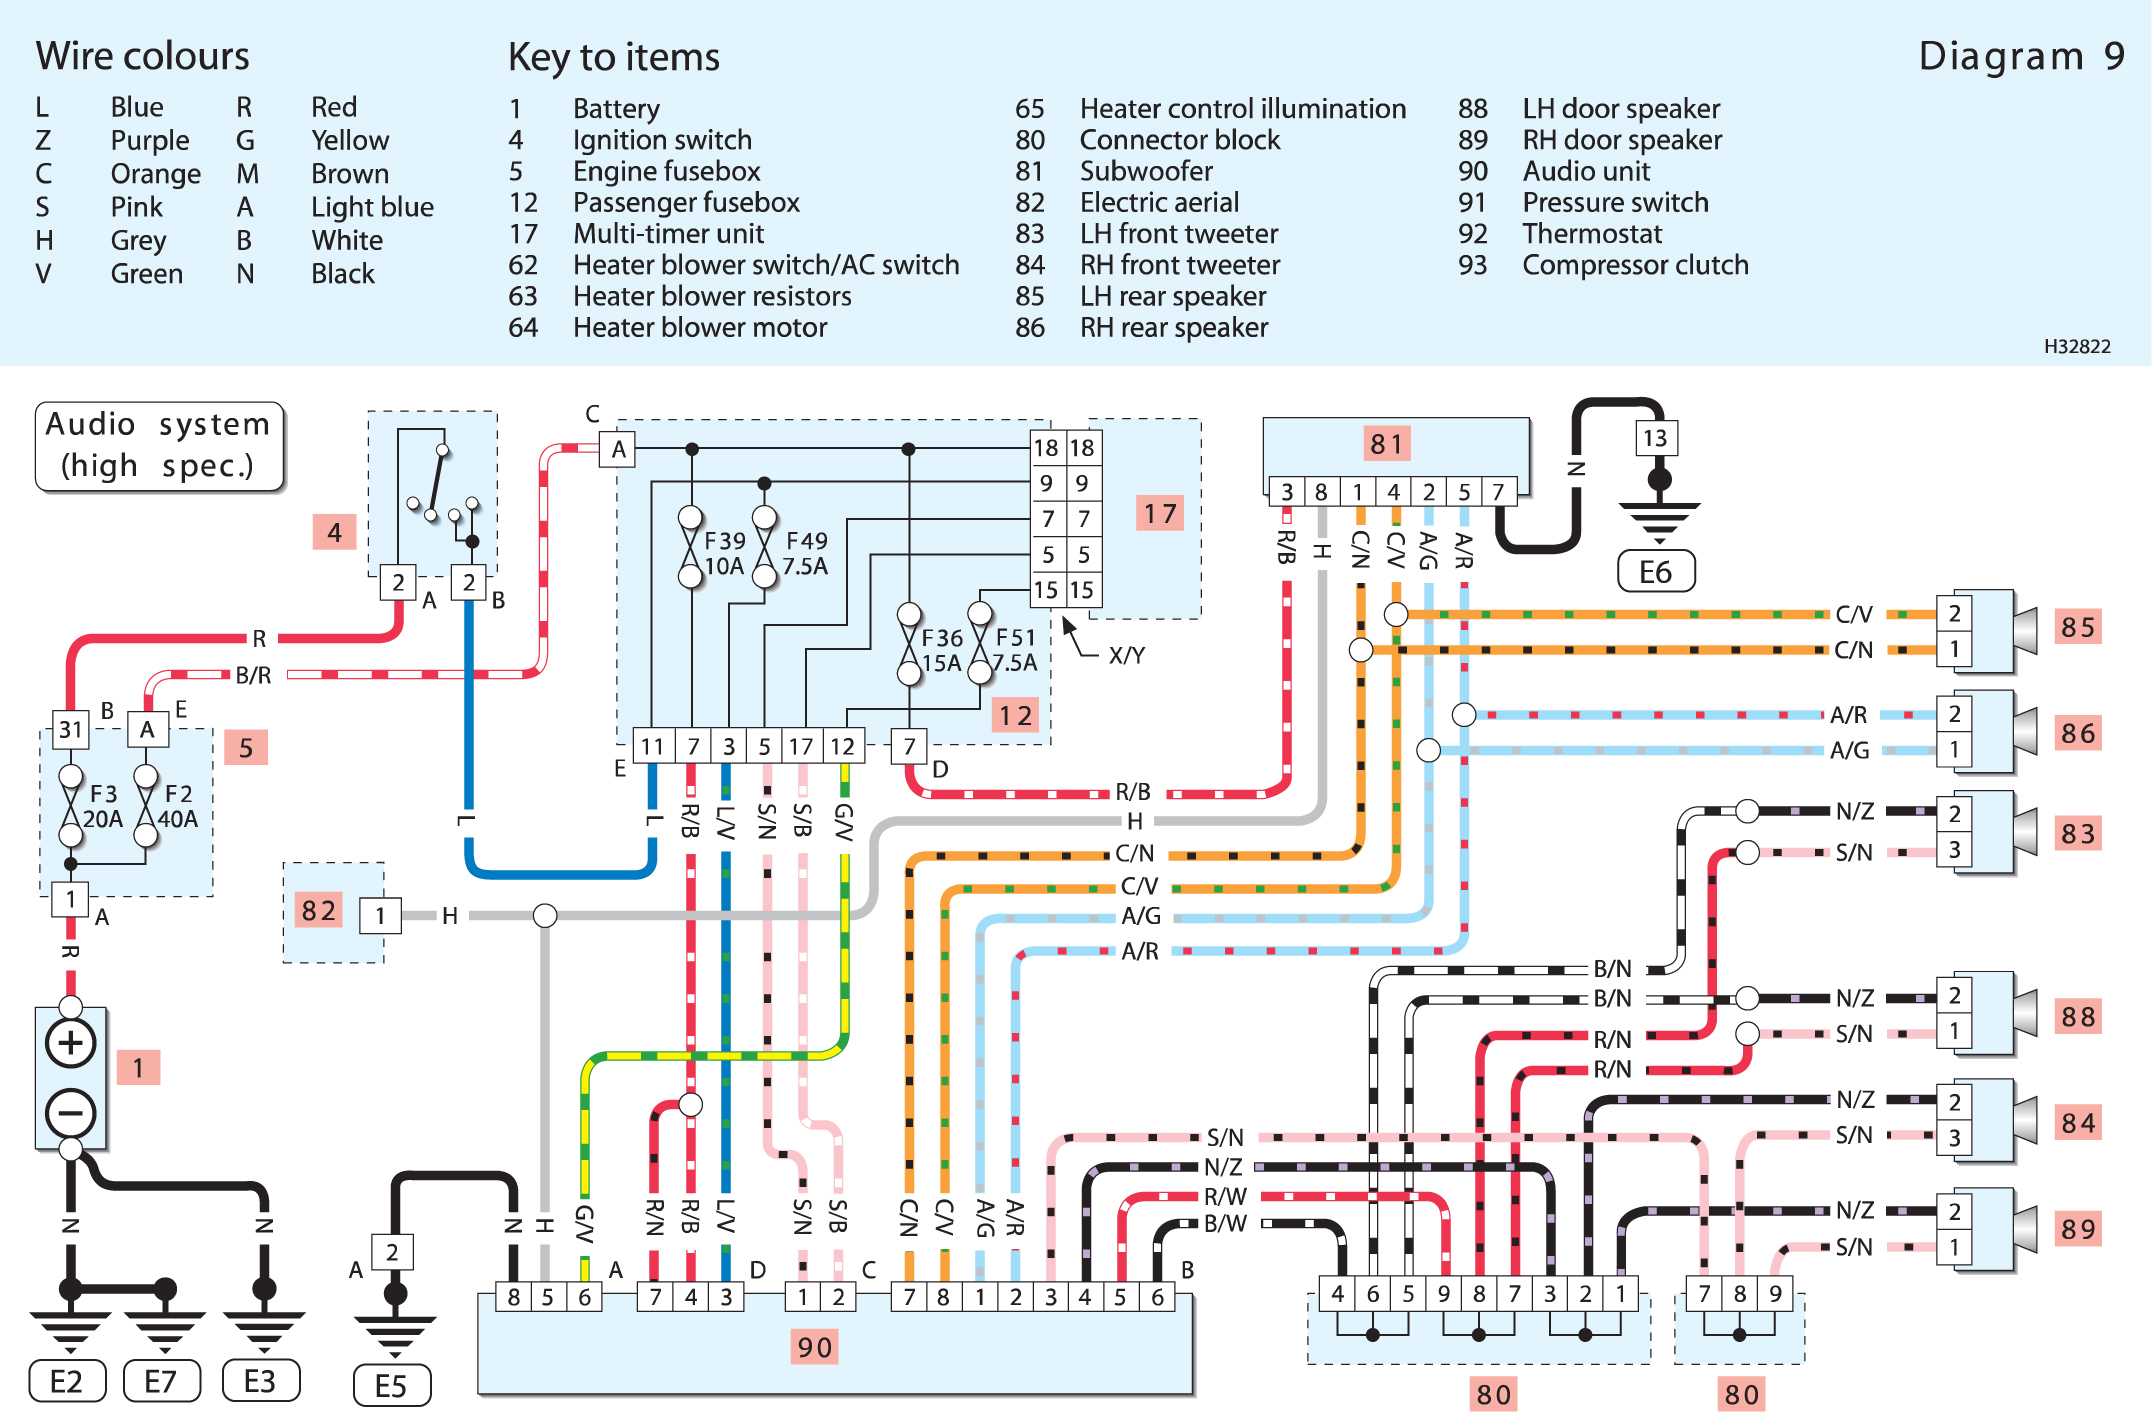 medium resolution of seicento wiring diagram wiring diagram and schematics daihatsu hijet wiring diagram fiat 600 wiring diagram